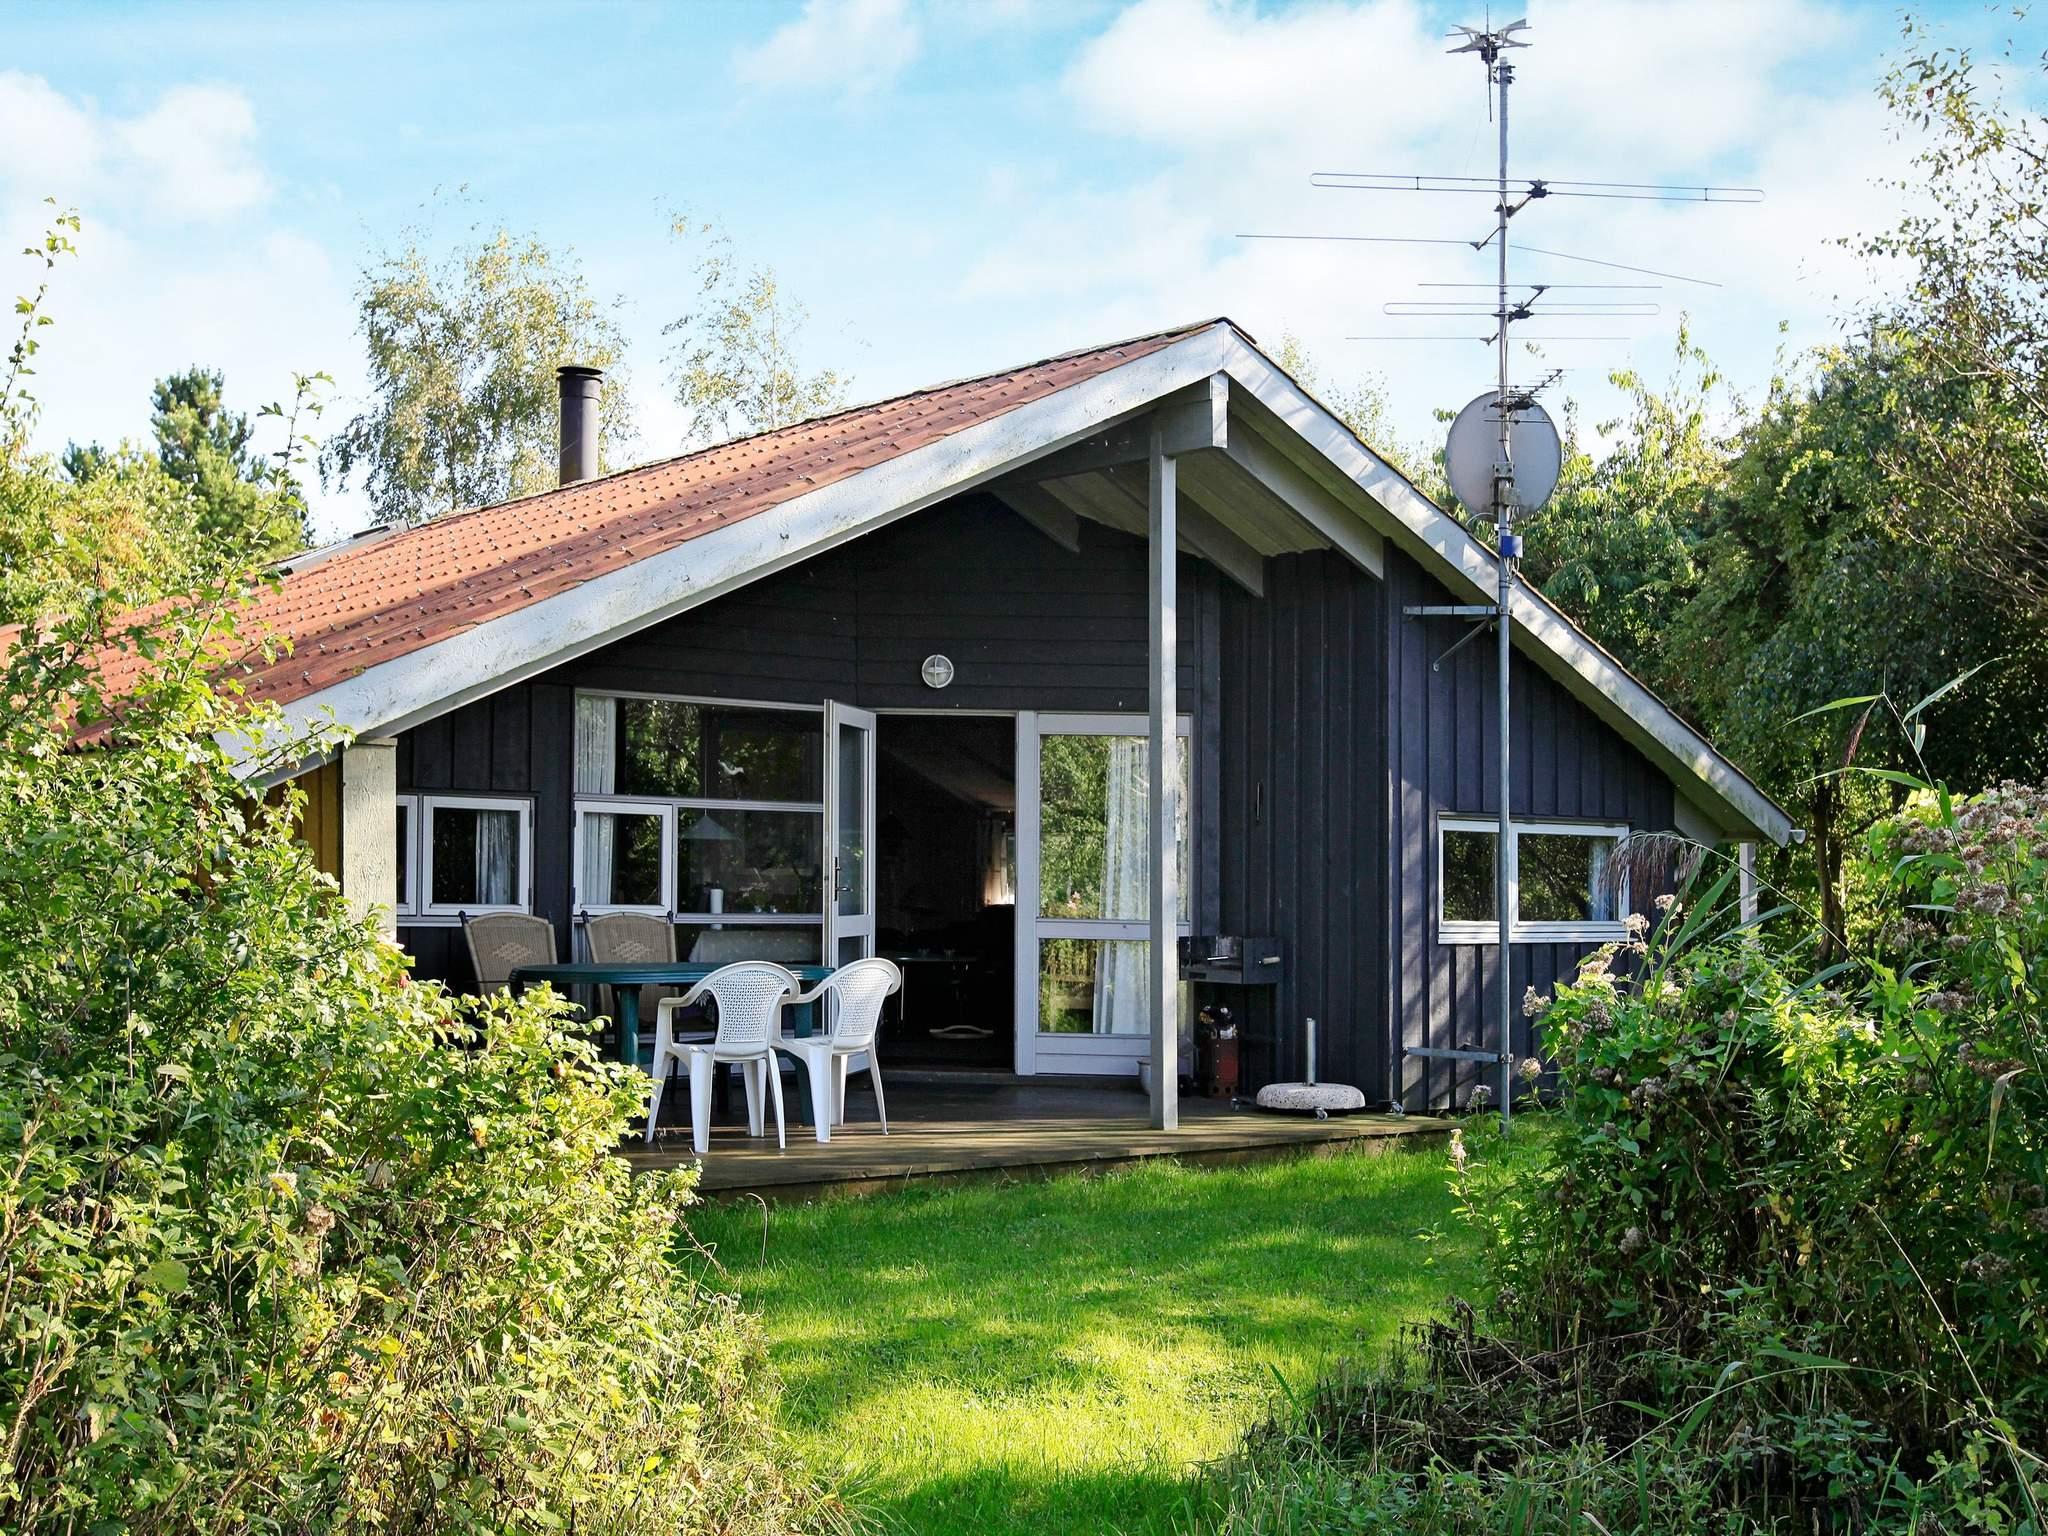 Ferienhaus Ristinge (93203), Ristinge, , Langeland, Dänemark, Bild 30